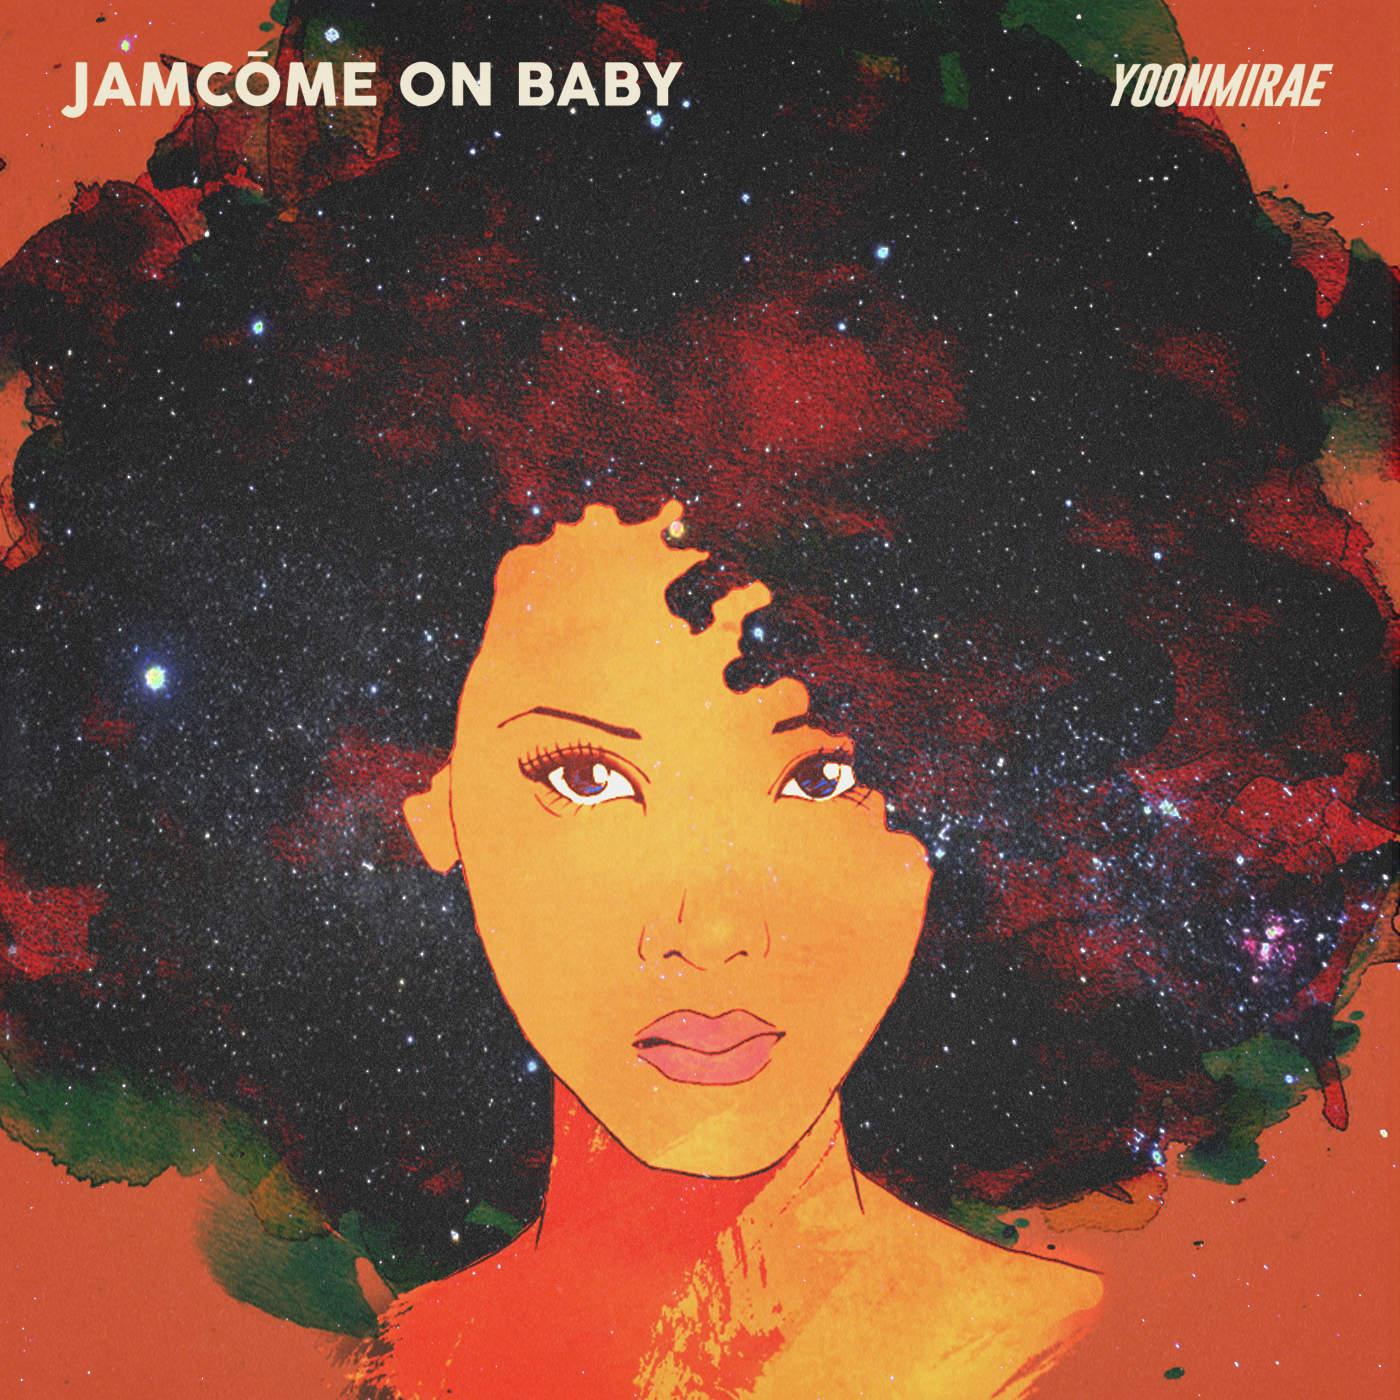 Yoon Mi Rae – JamCome On Baby – Single (FLAC + ITUNES PLUS AAC M4A)